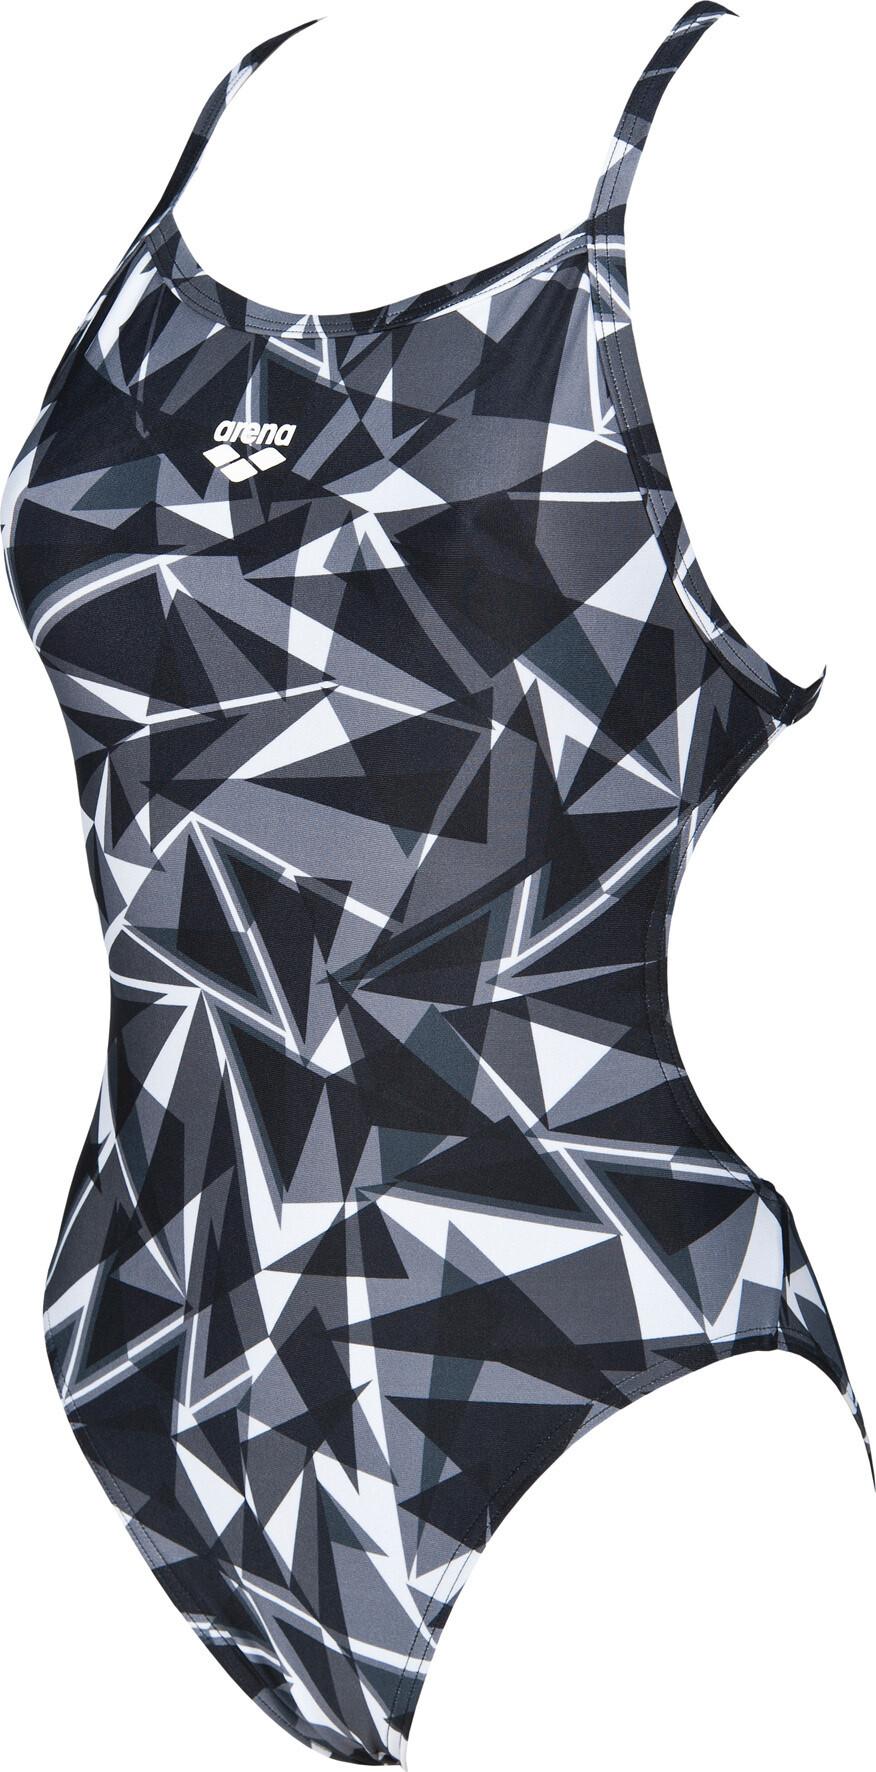 a1e8402c5e De Shattered Maillot Bain Glass Femme Tech Light Noir Arena 8kwPXn0O